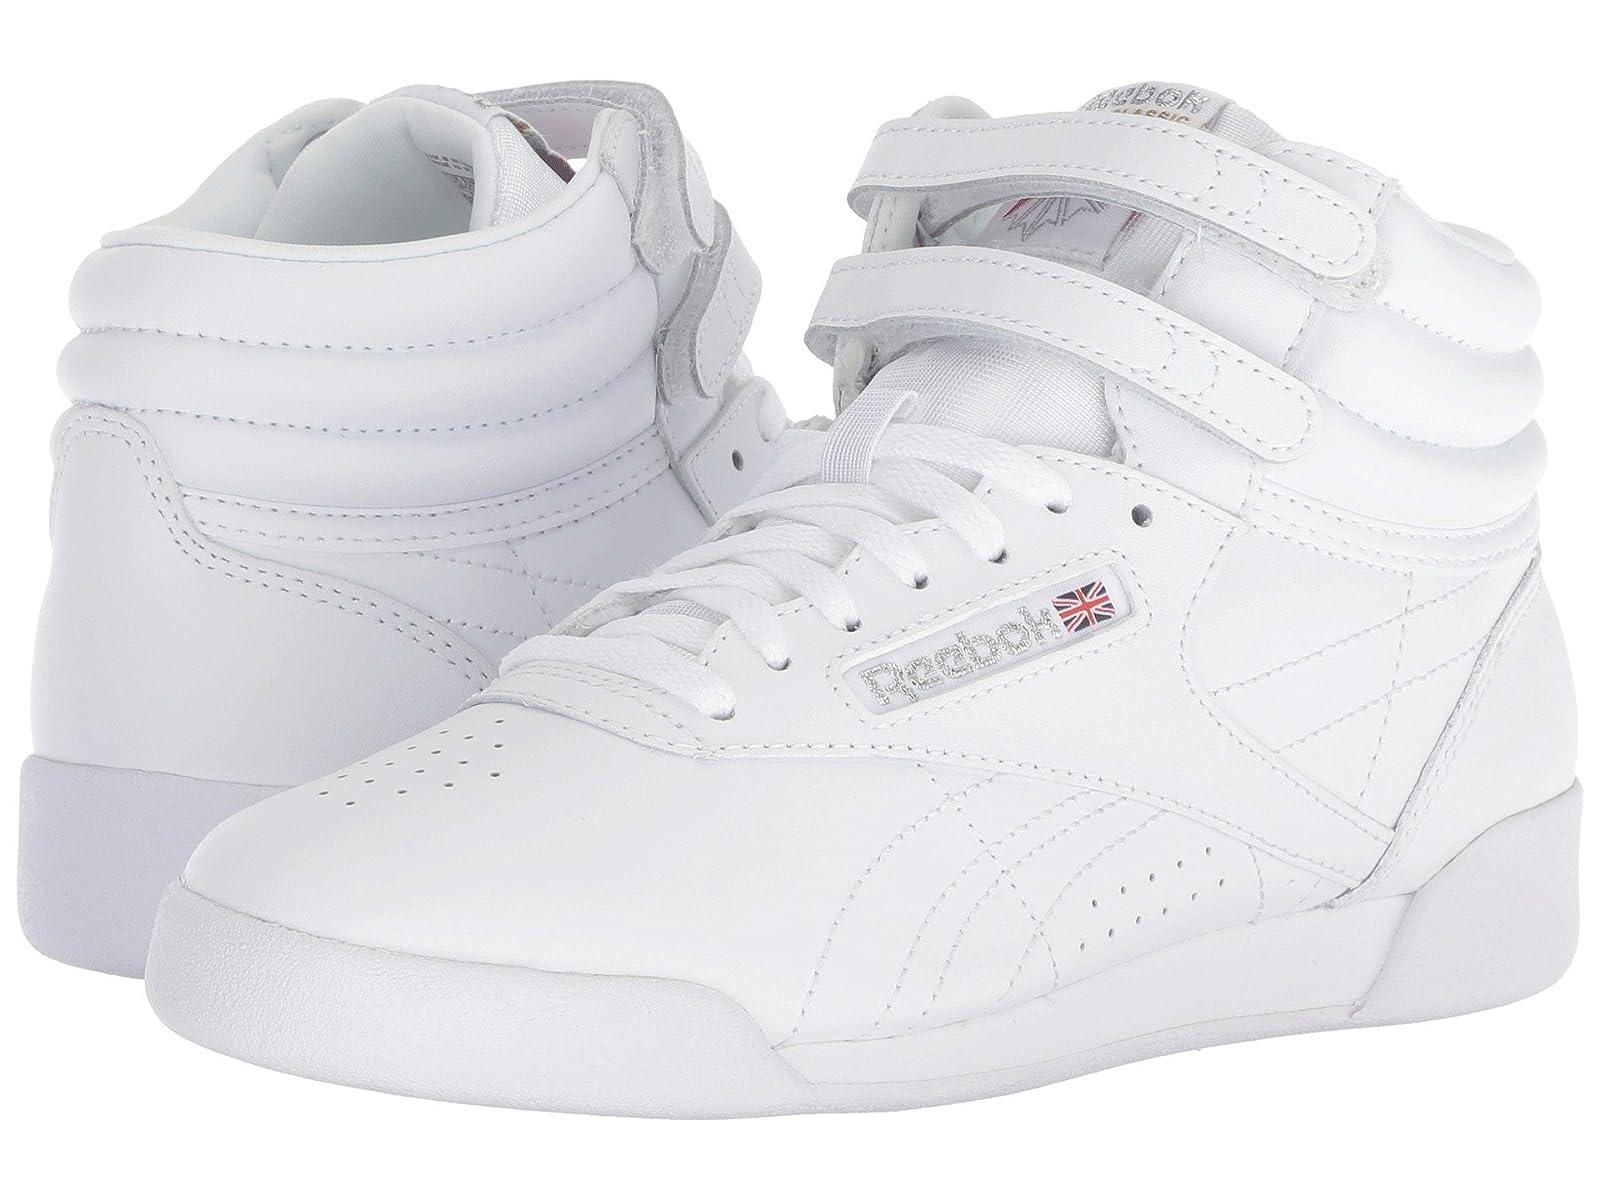 Reebok Kids Freestyle Hi (Big Kid)Atmospheric grades have affordable shoes